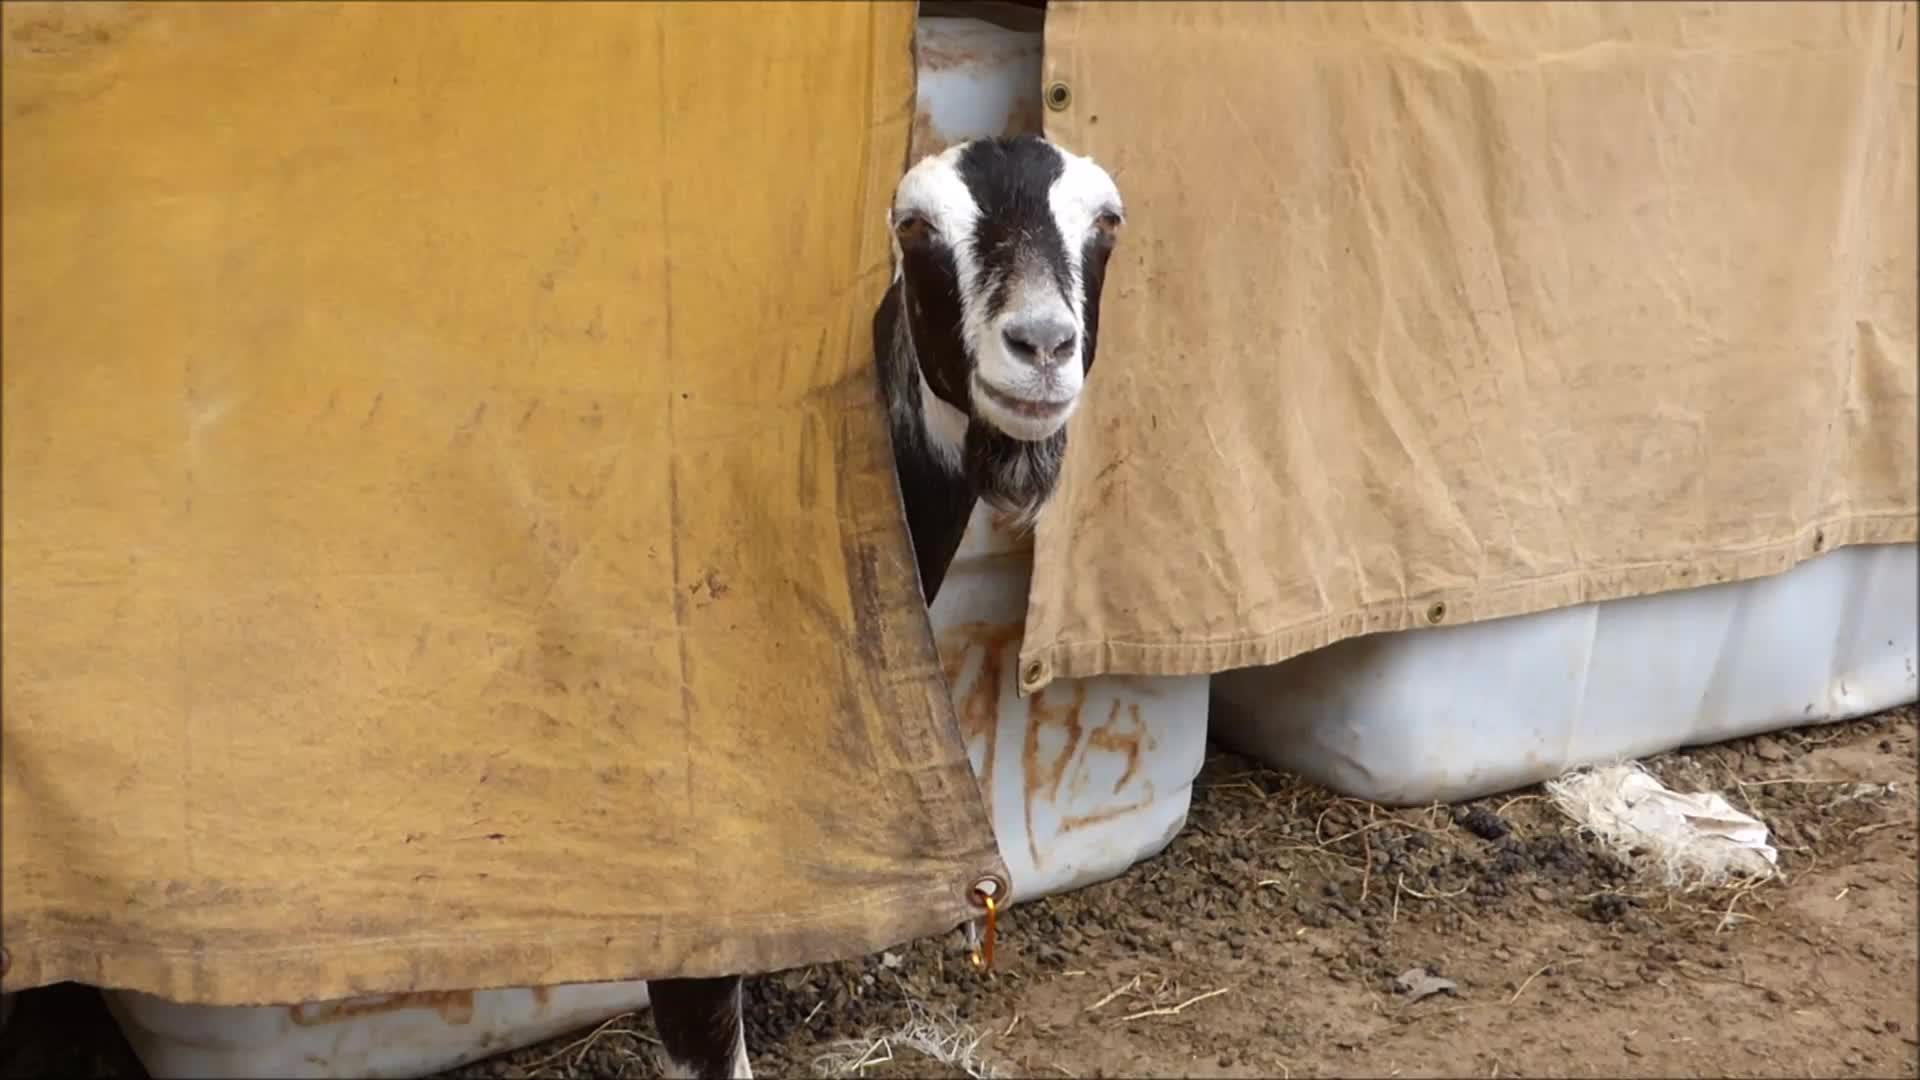 animalsbeingderps, aww, eyebleach, funny, goat, knsfarm, Heidi's Clip GIFs